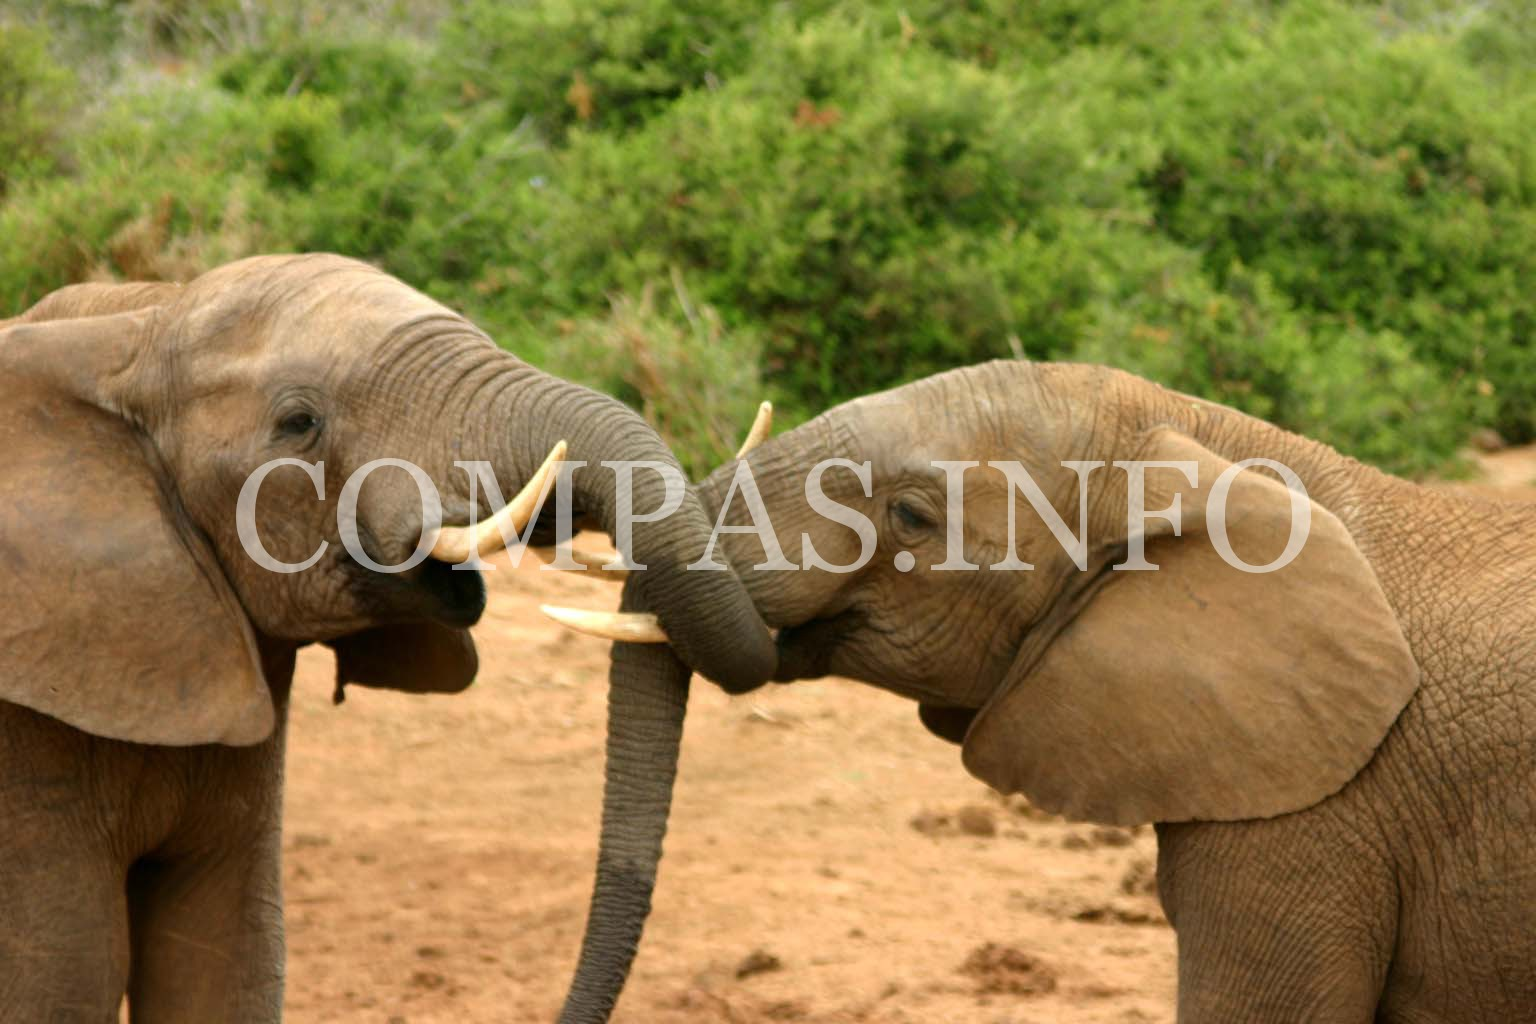 Elephants_mating_ritual_2